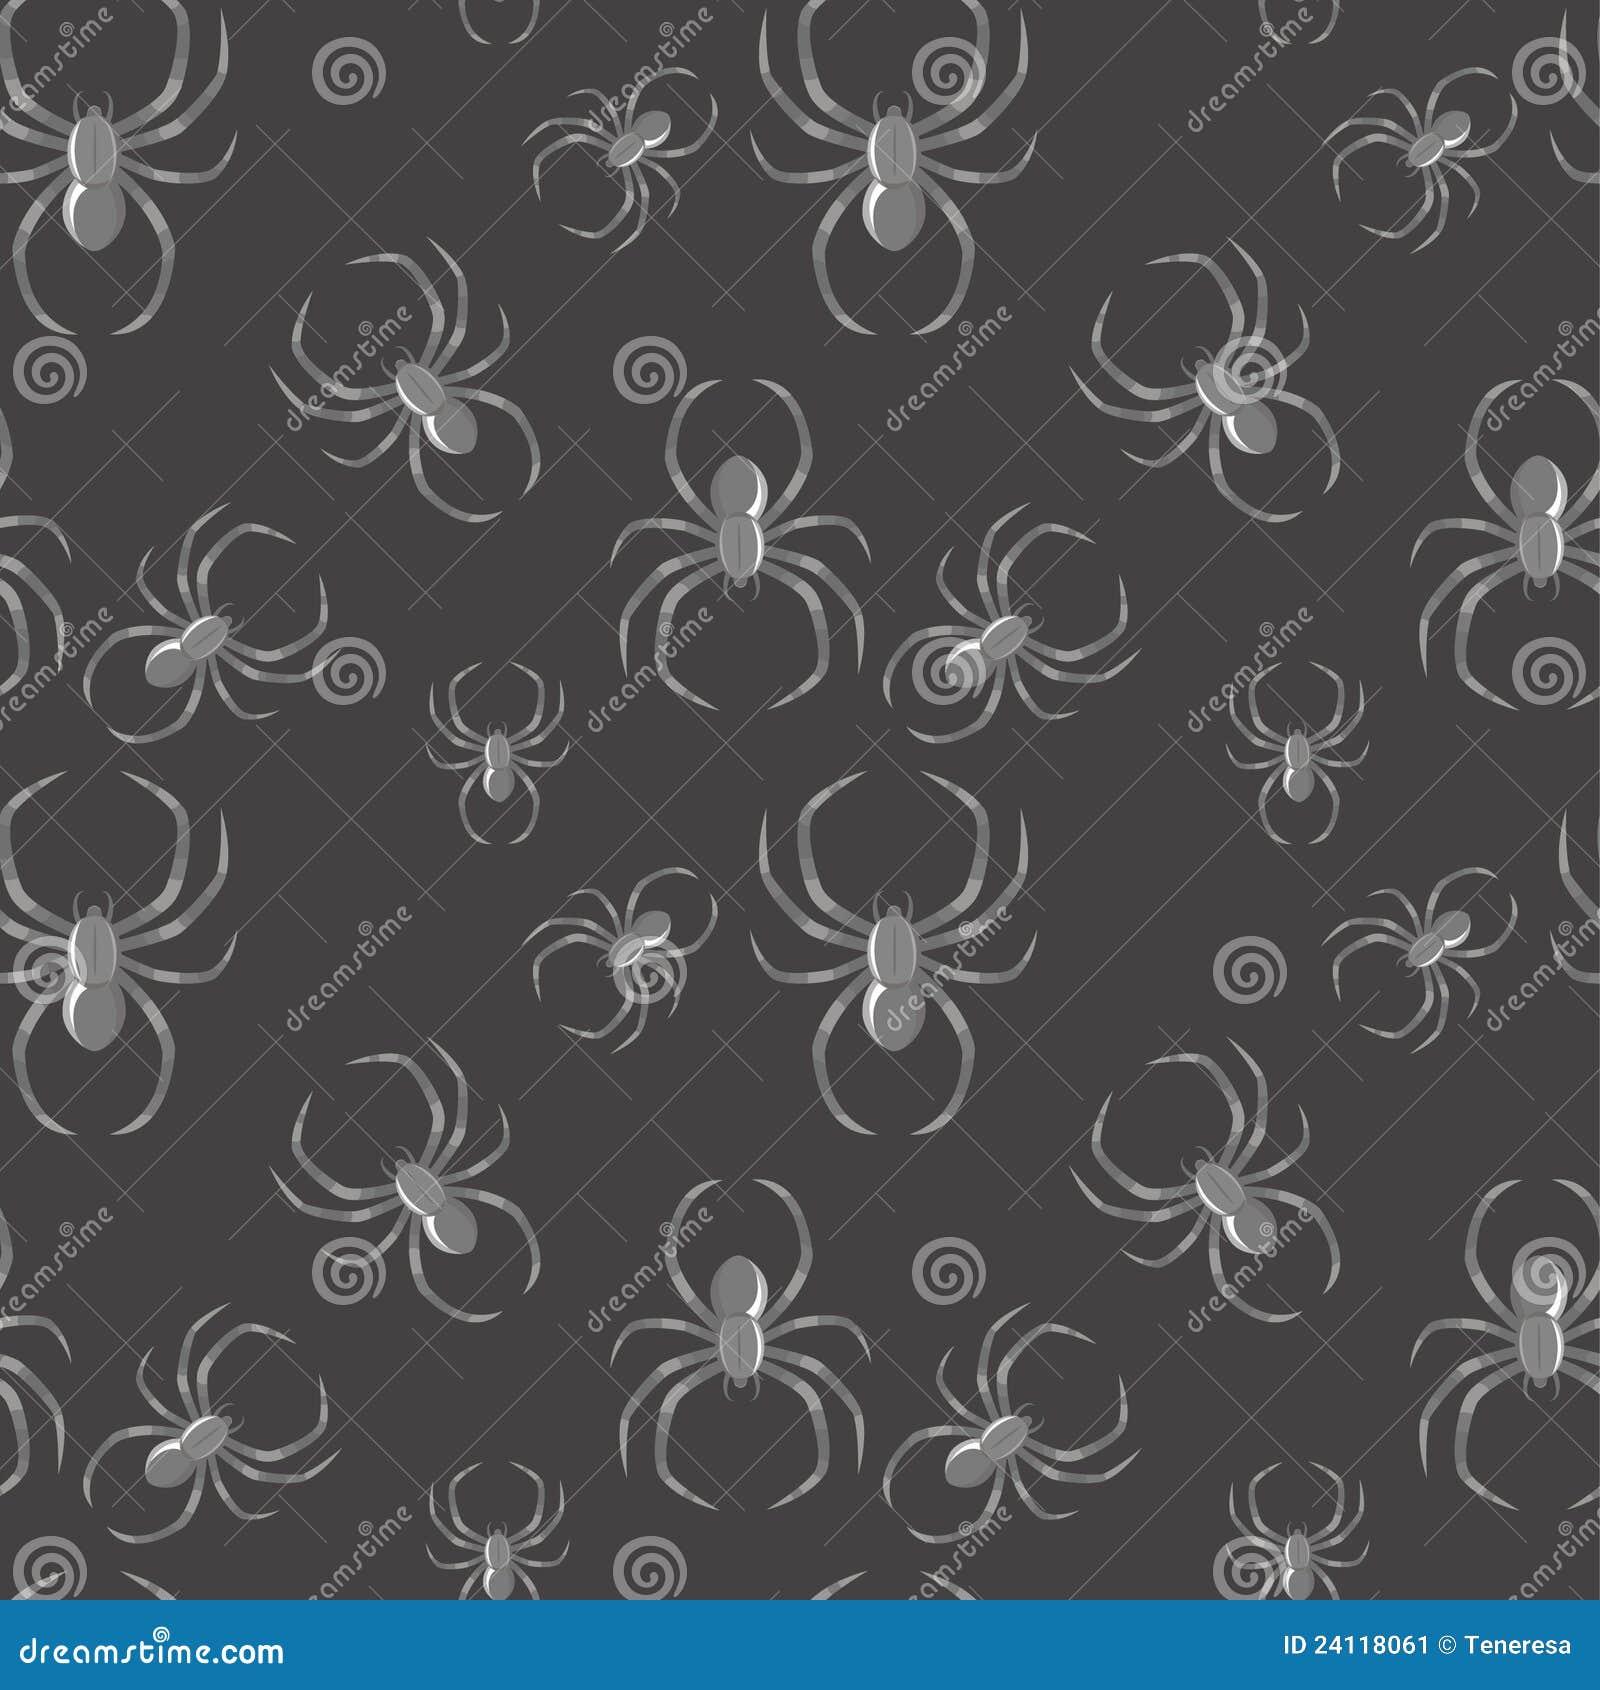 gothic patterns wallpaper pattern - photo #31